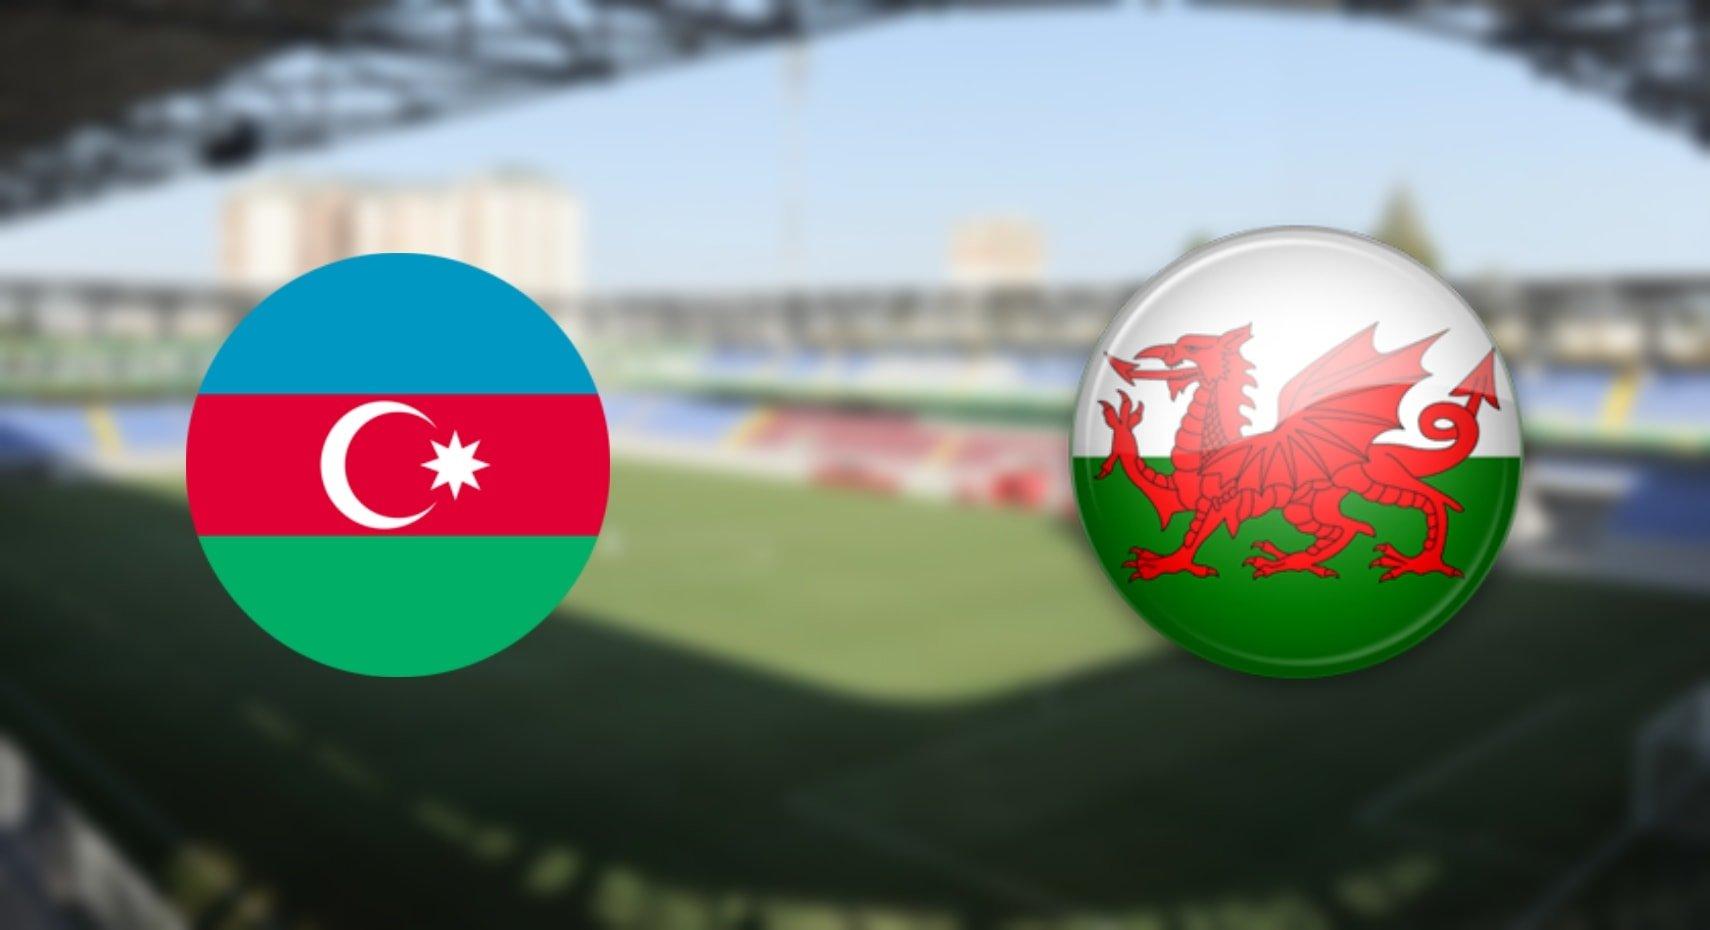 Azerbaijan vs Wales Prediction: Euro 2020 Qualification Match on 16.11.2019